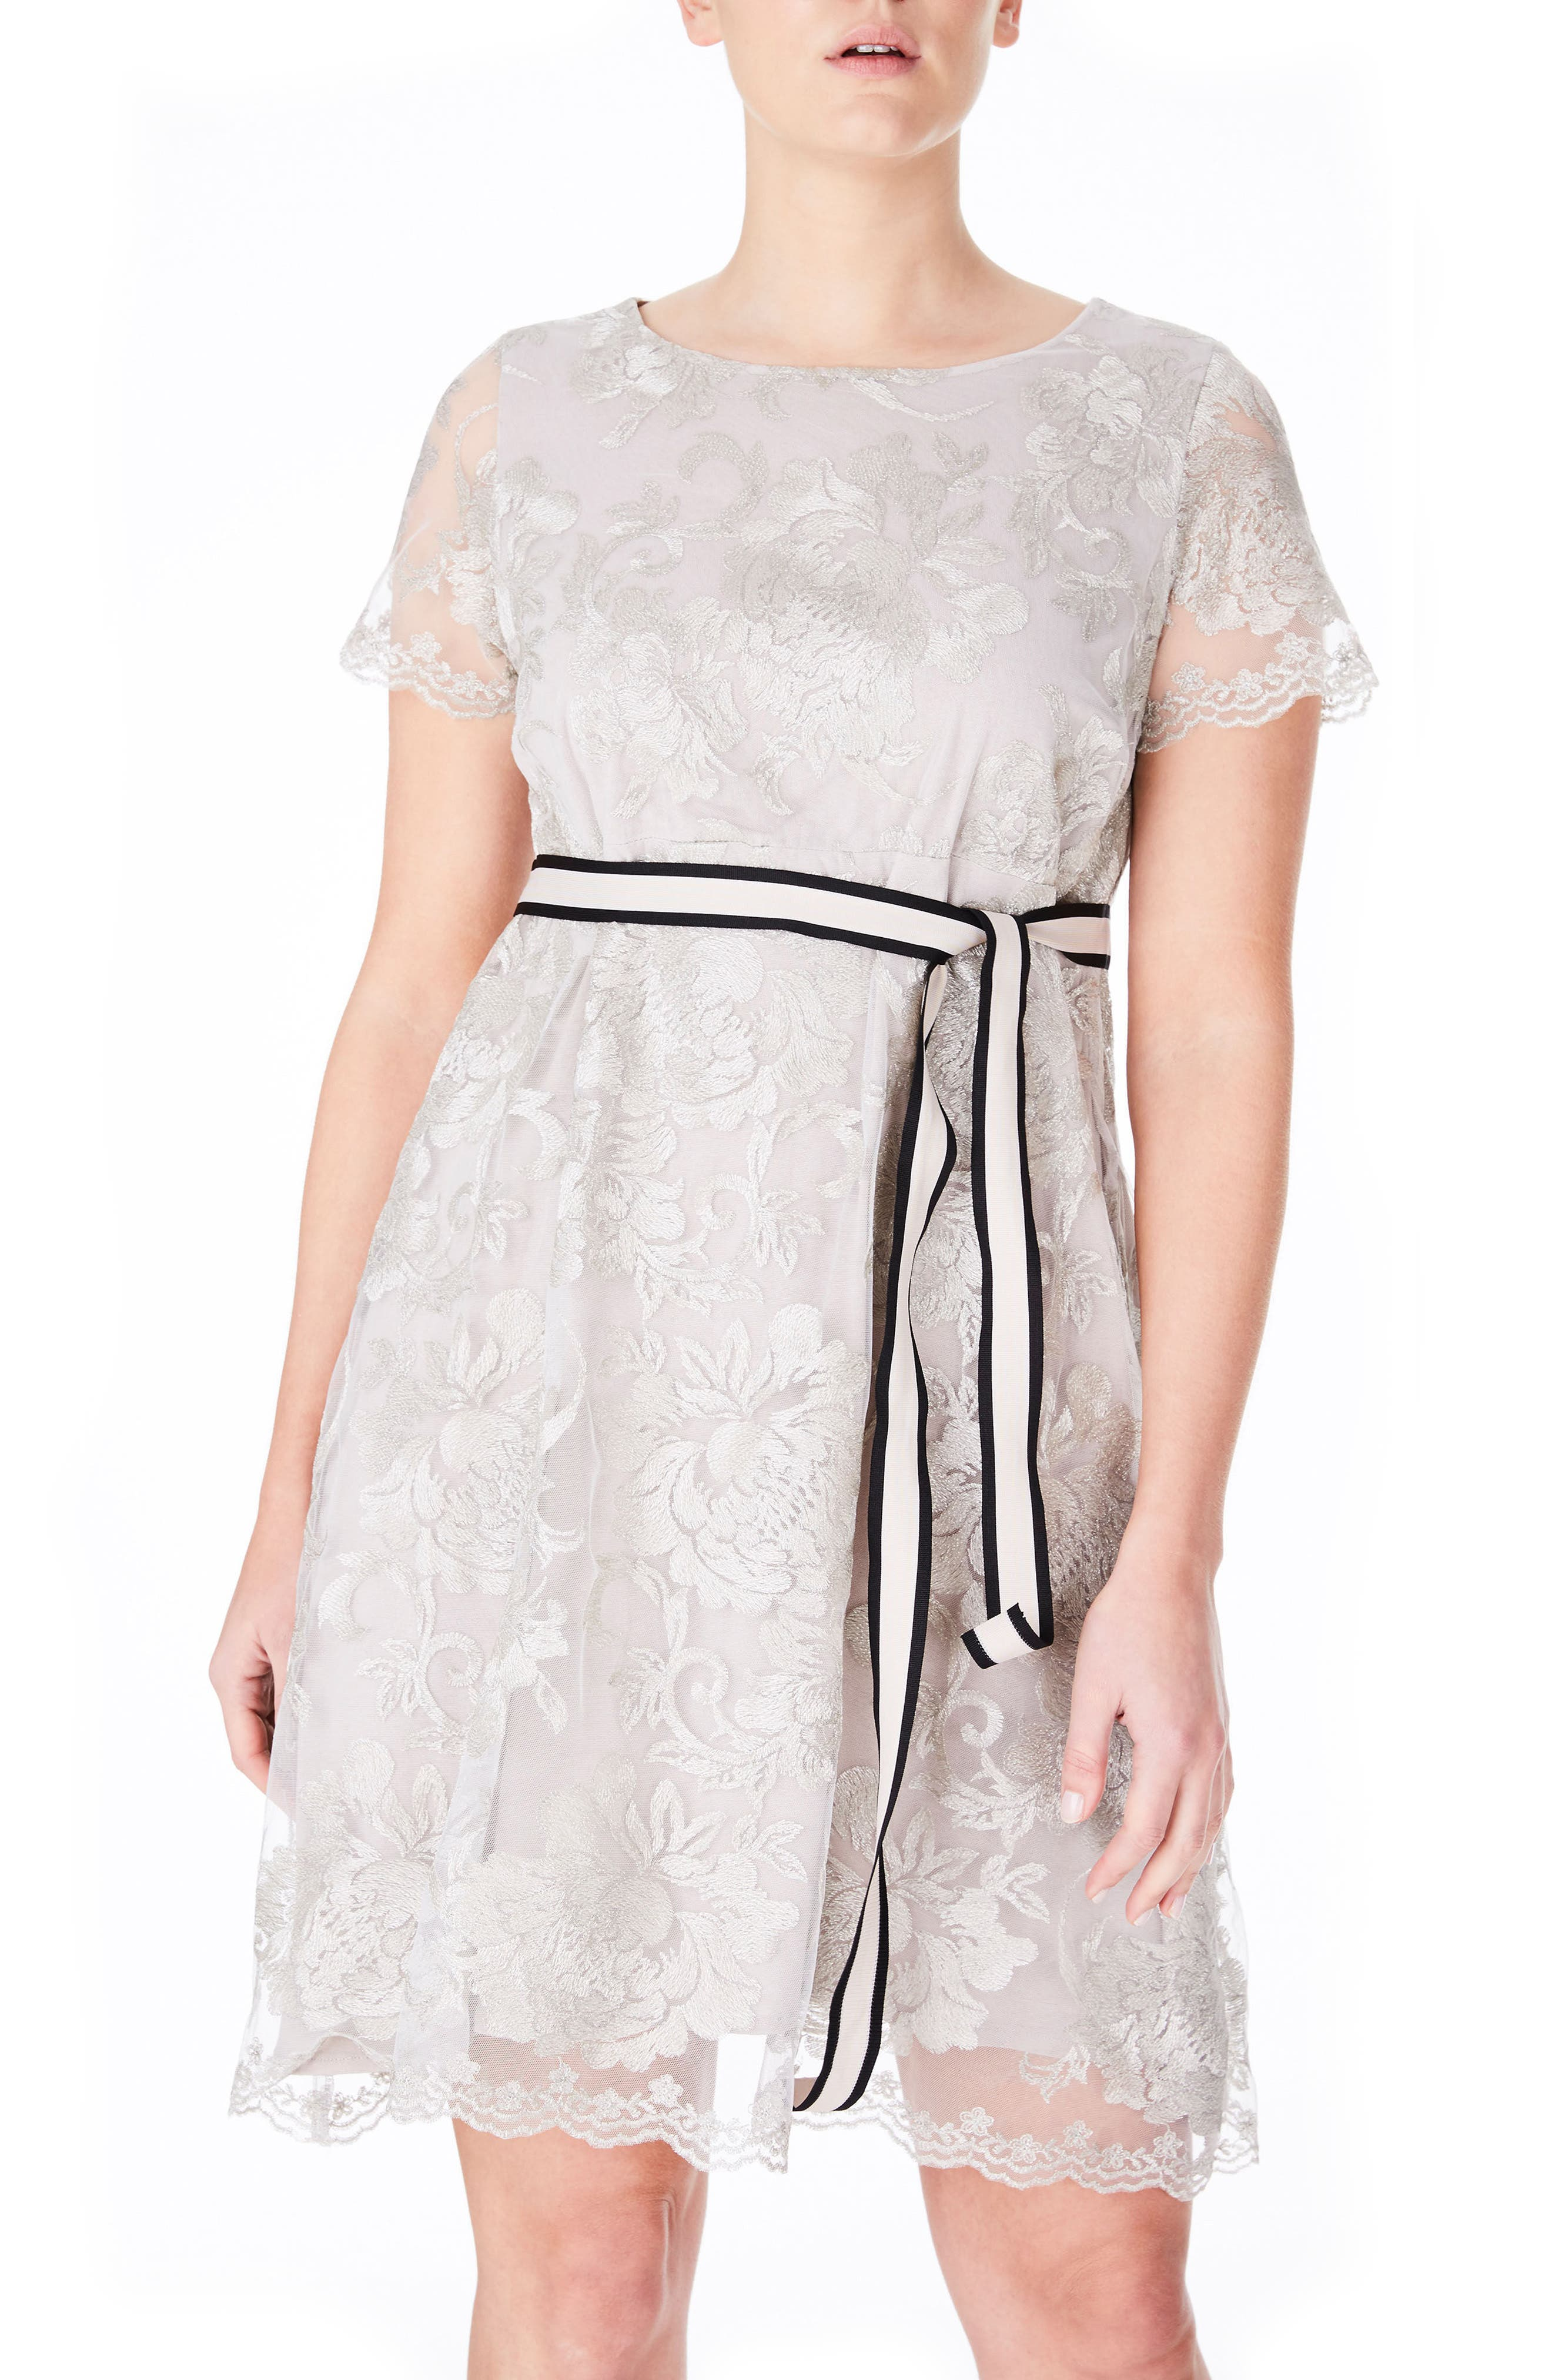 ELVI Lace Babydoll Dress (Plus Size)